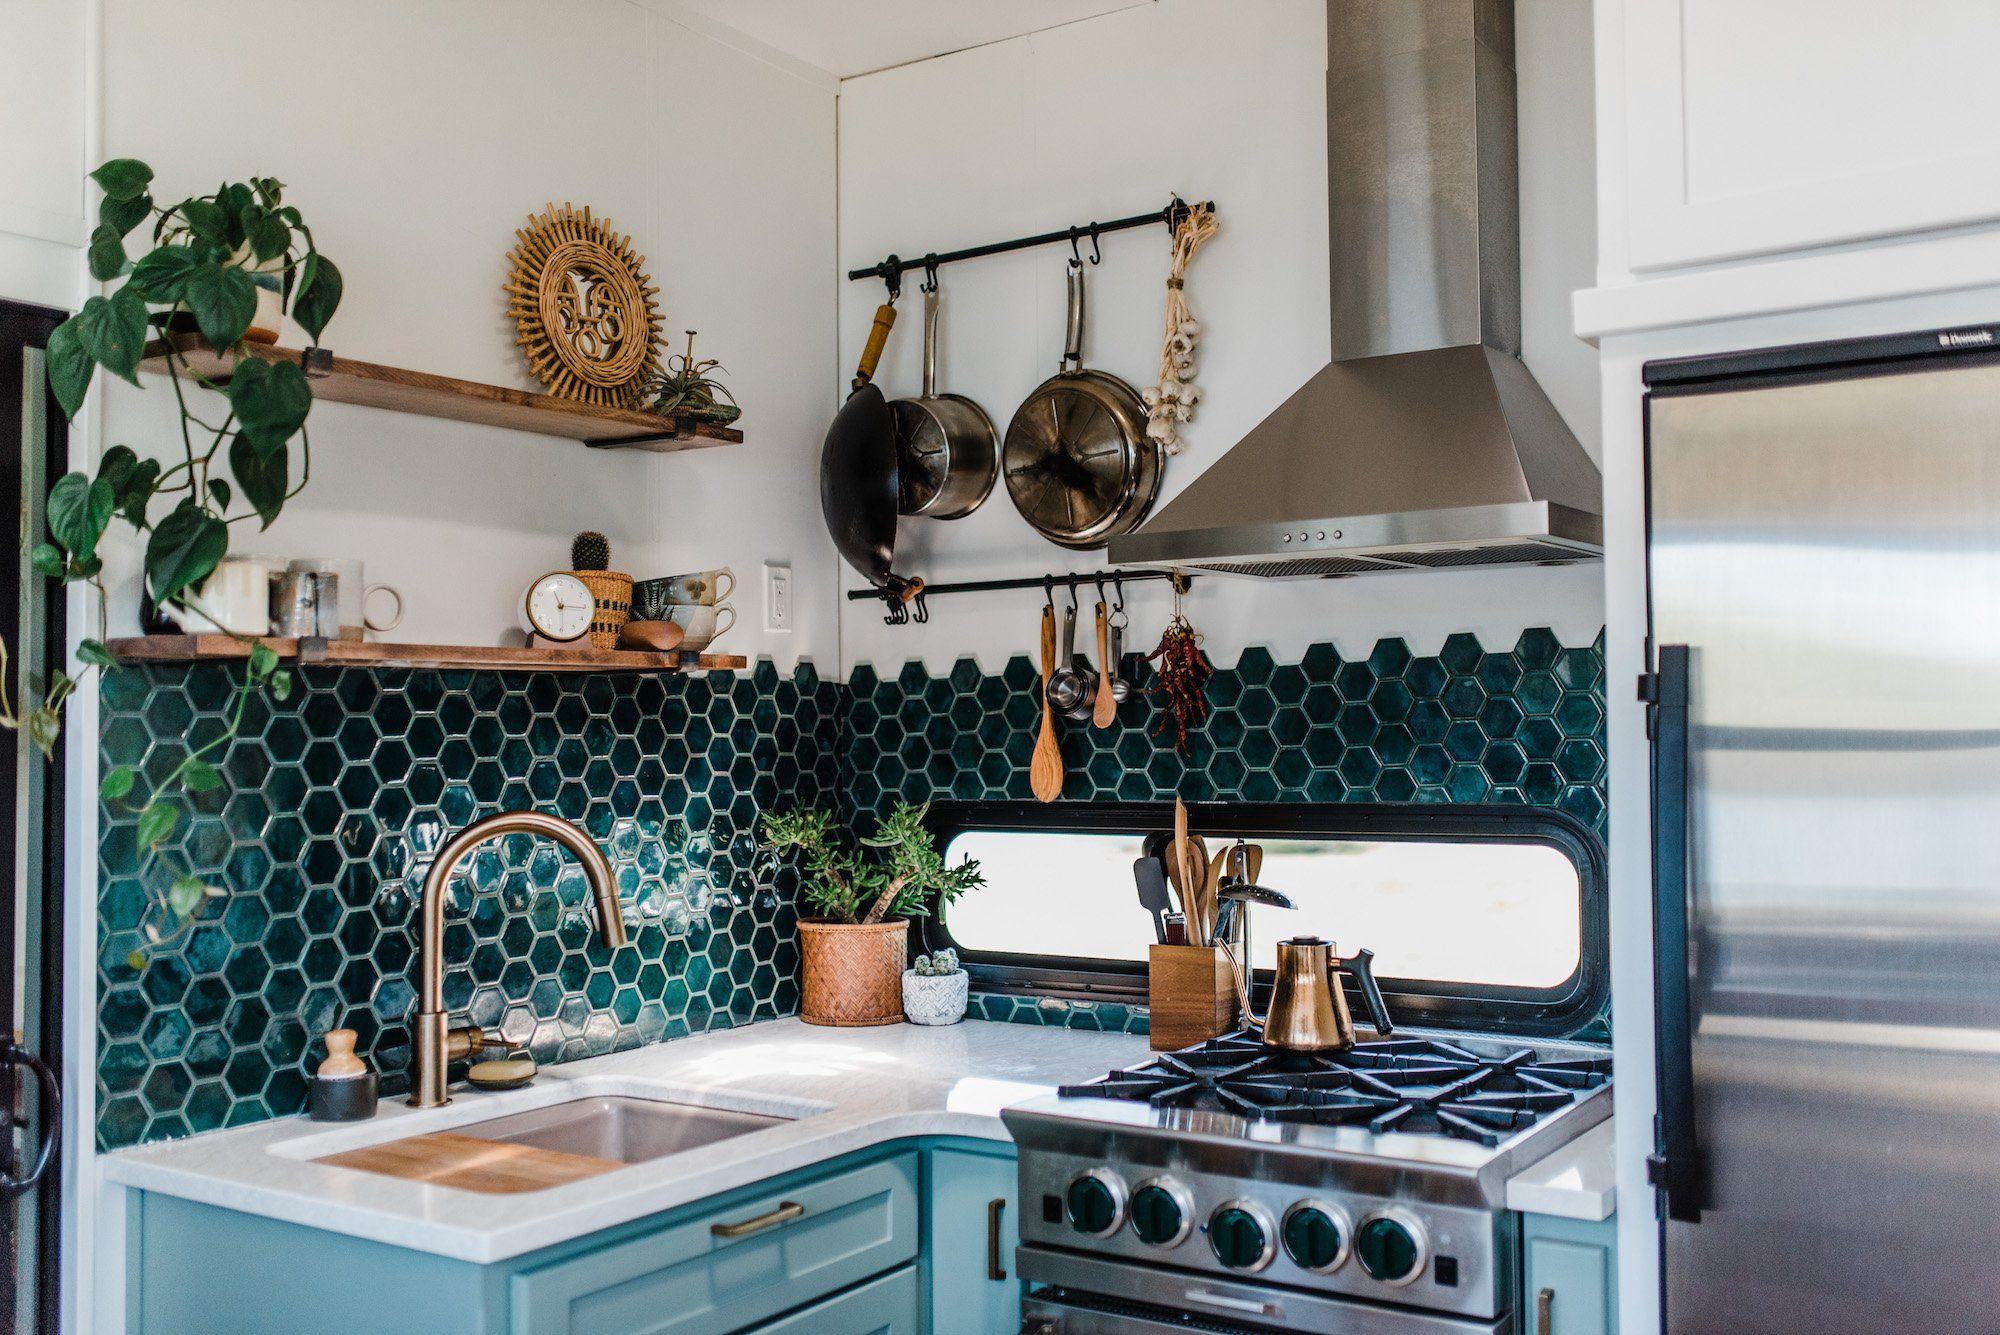 Best Bohemian Tile Deep Teal Bluegrass Hexagons Small Kitchen Backsplash Green Kitchen Kitchen Design